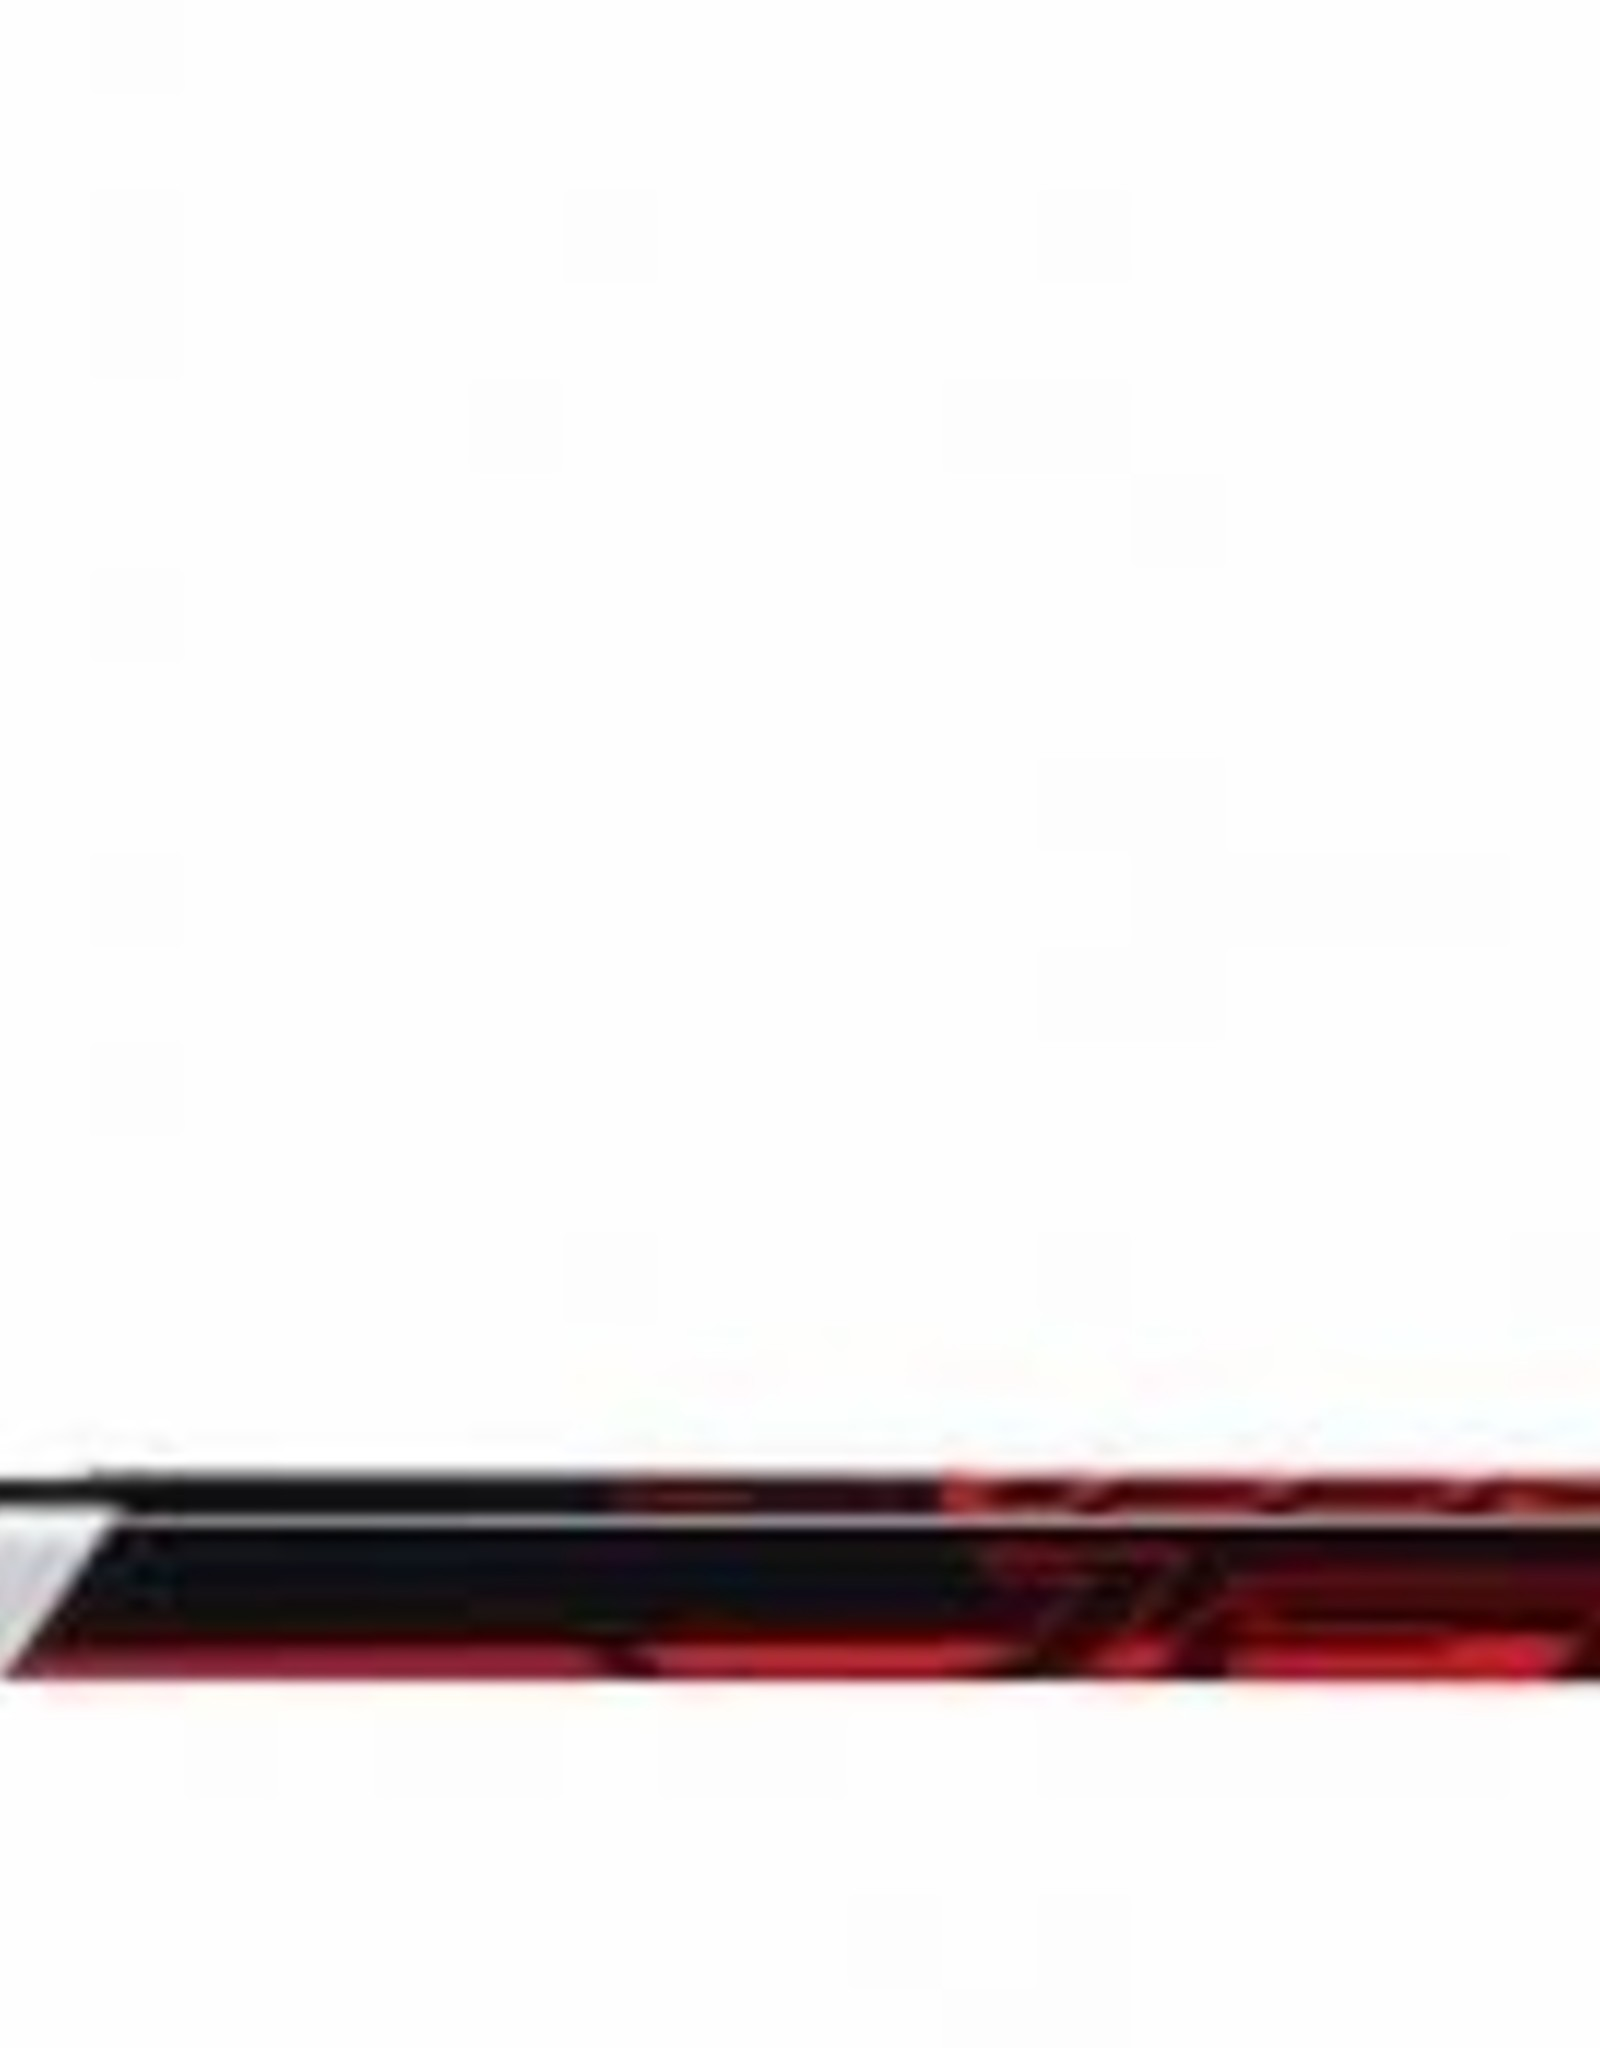 CCM Jetspeed FT465 Stick SR